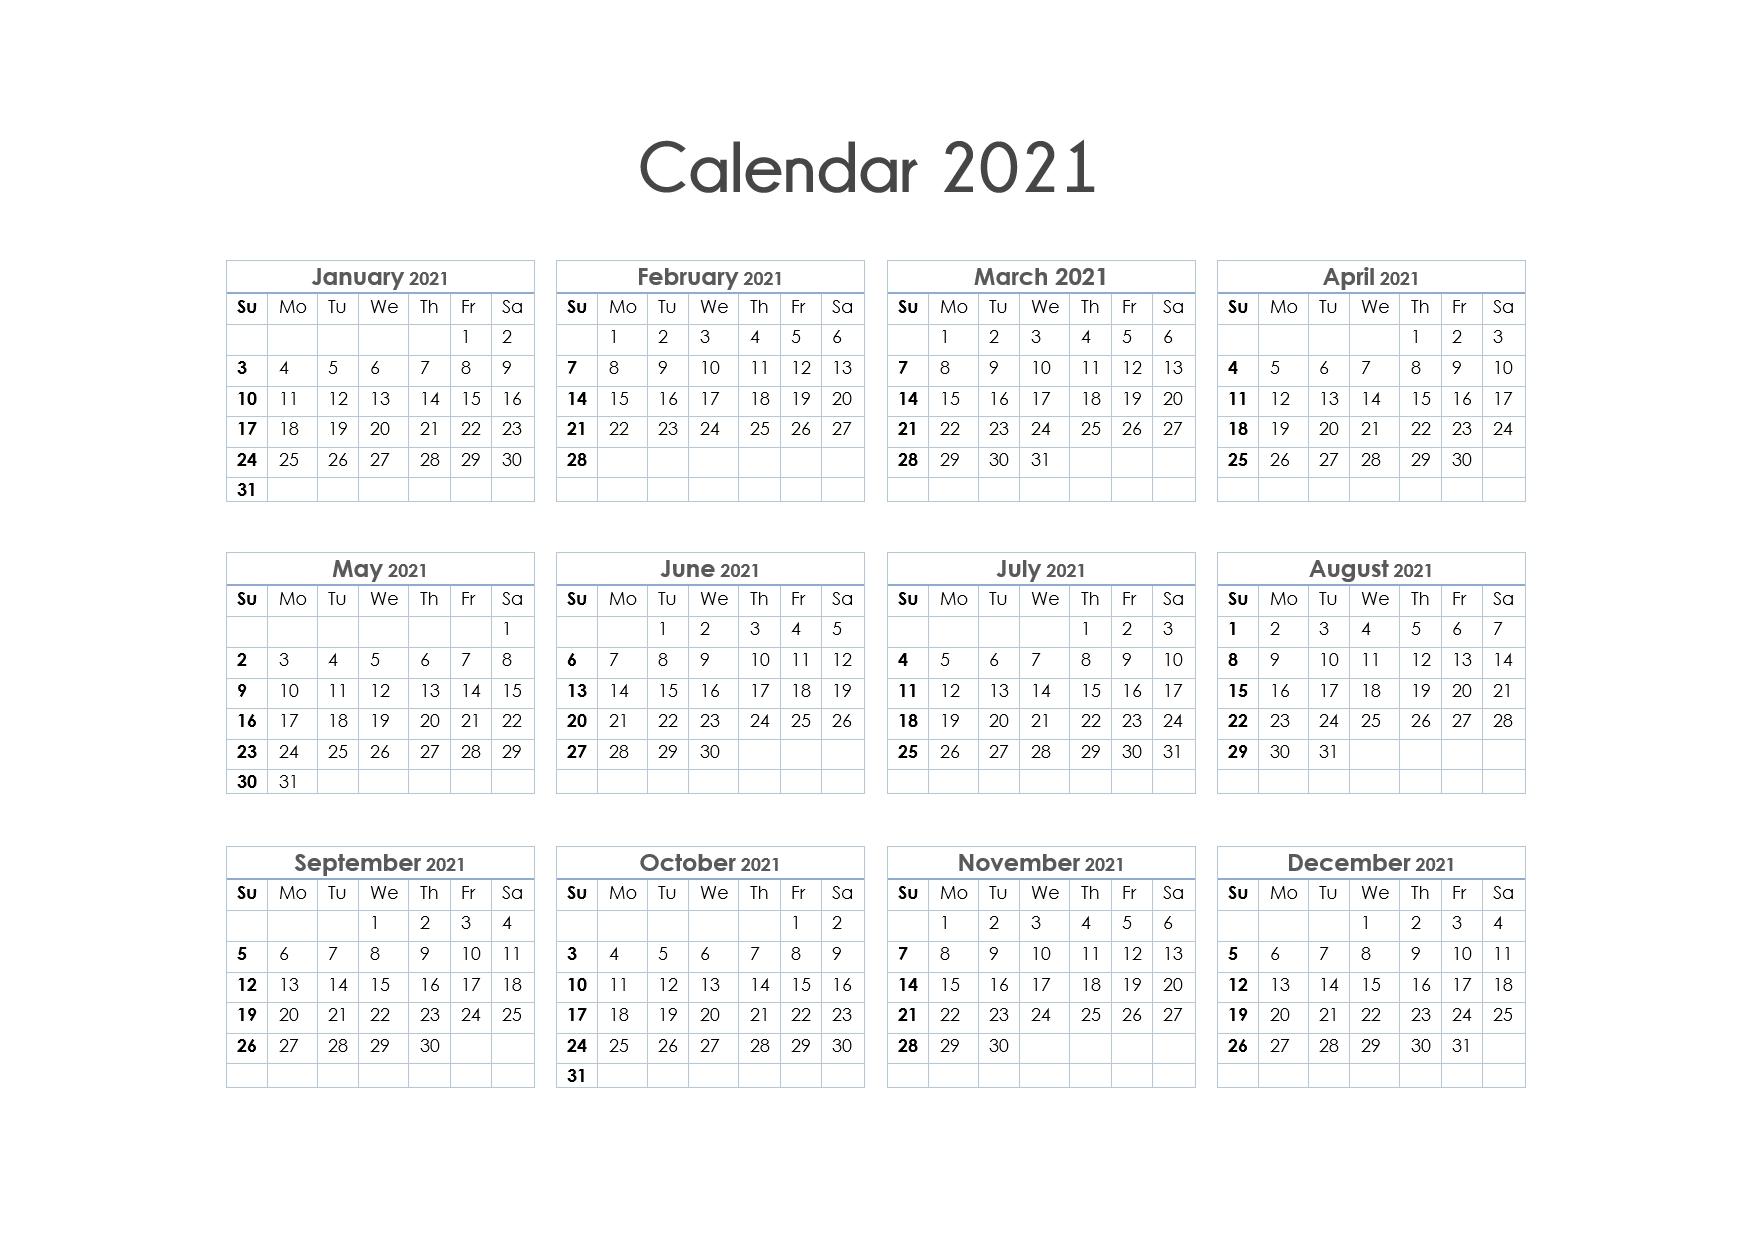 56+ Printable Calendar 2021 One Page, Us 2021 Calendar  2021 Calendar Printable One Page Free